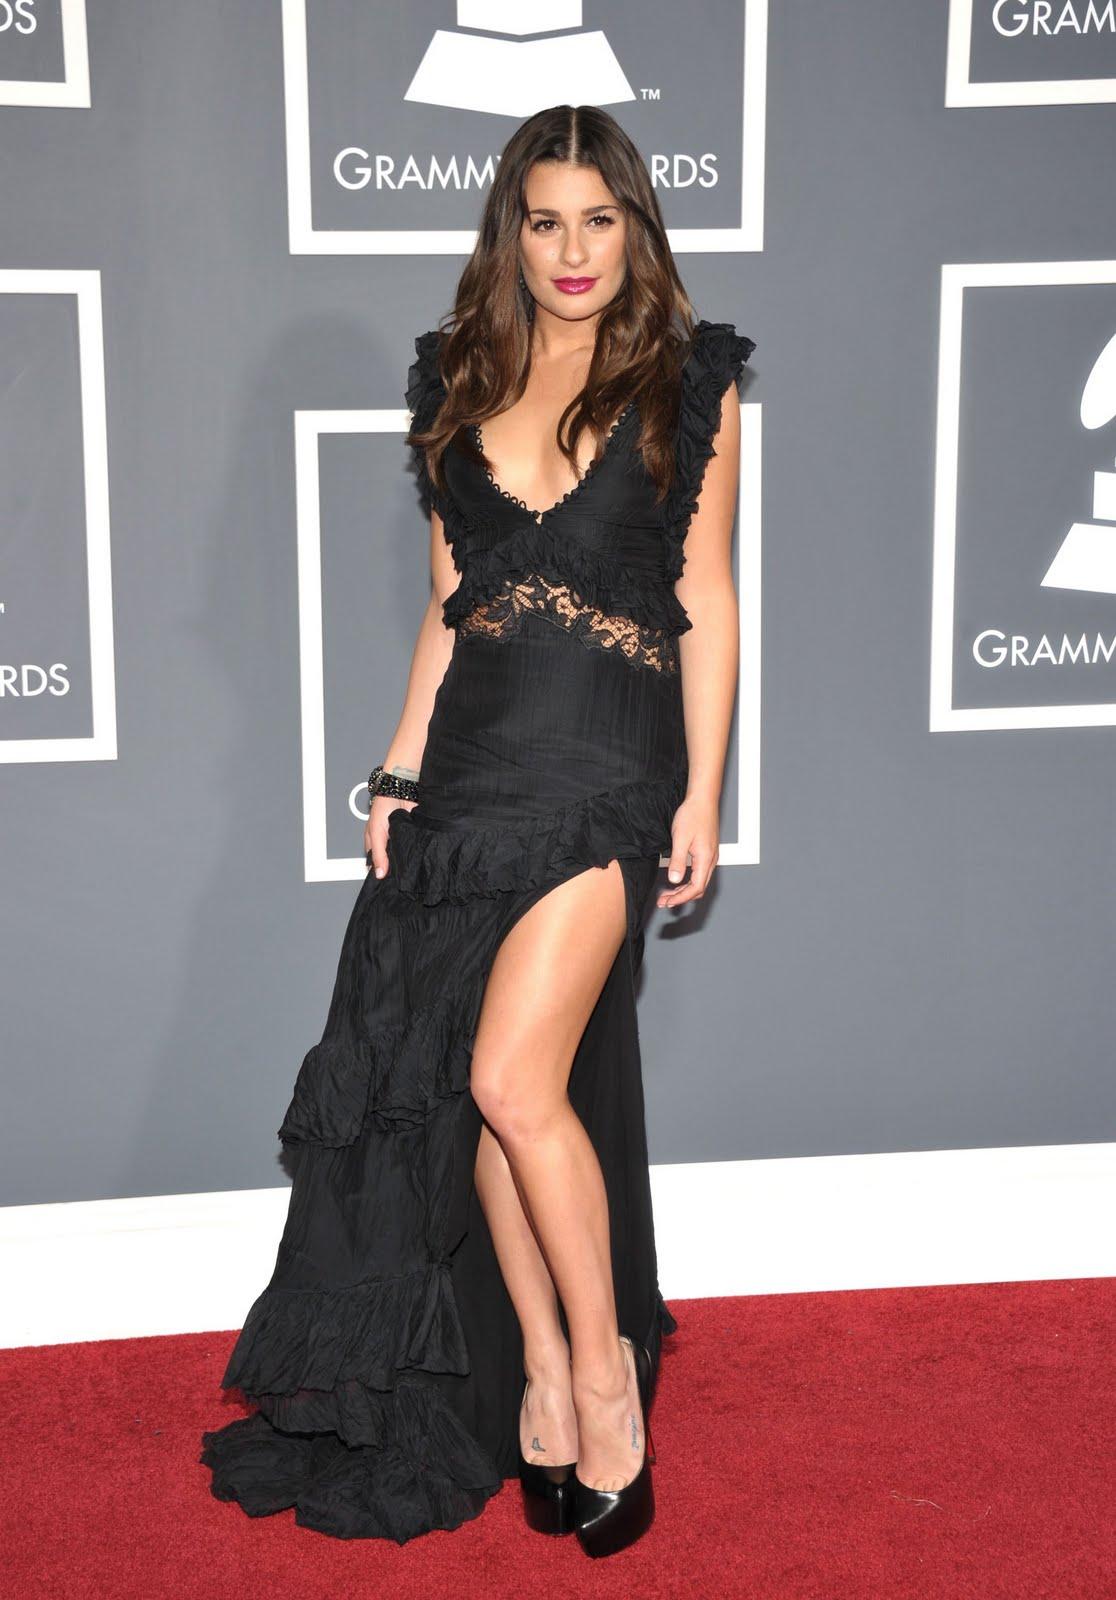 http://4.bp.blogspot.com/-TIPfPecdxiw/TjcV0Bv2ZHI/AAAAAAAAJQg/kP5rWu-twNI/s1600/Tikipeter_Lea_Michele_53rd_Annual_GRAMMY_Awards_045.jpg